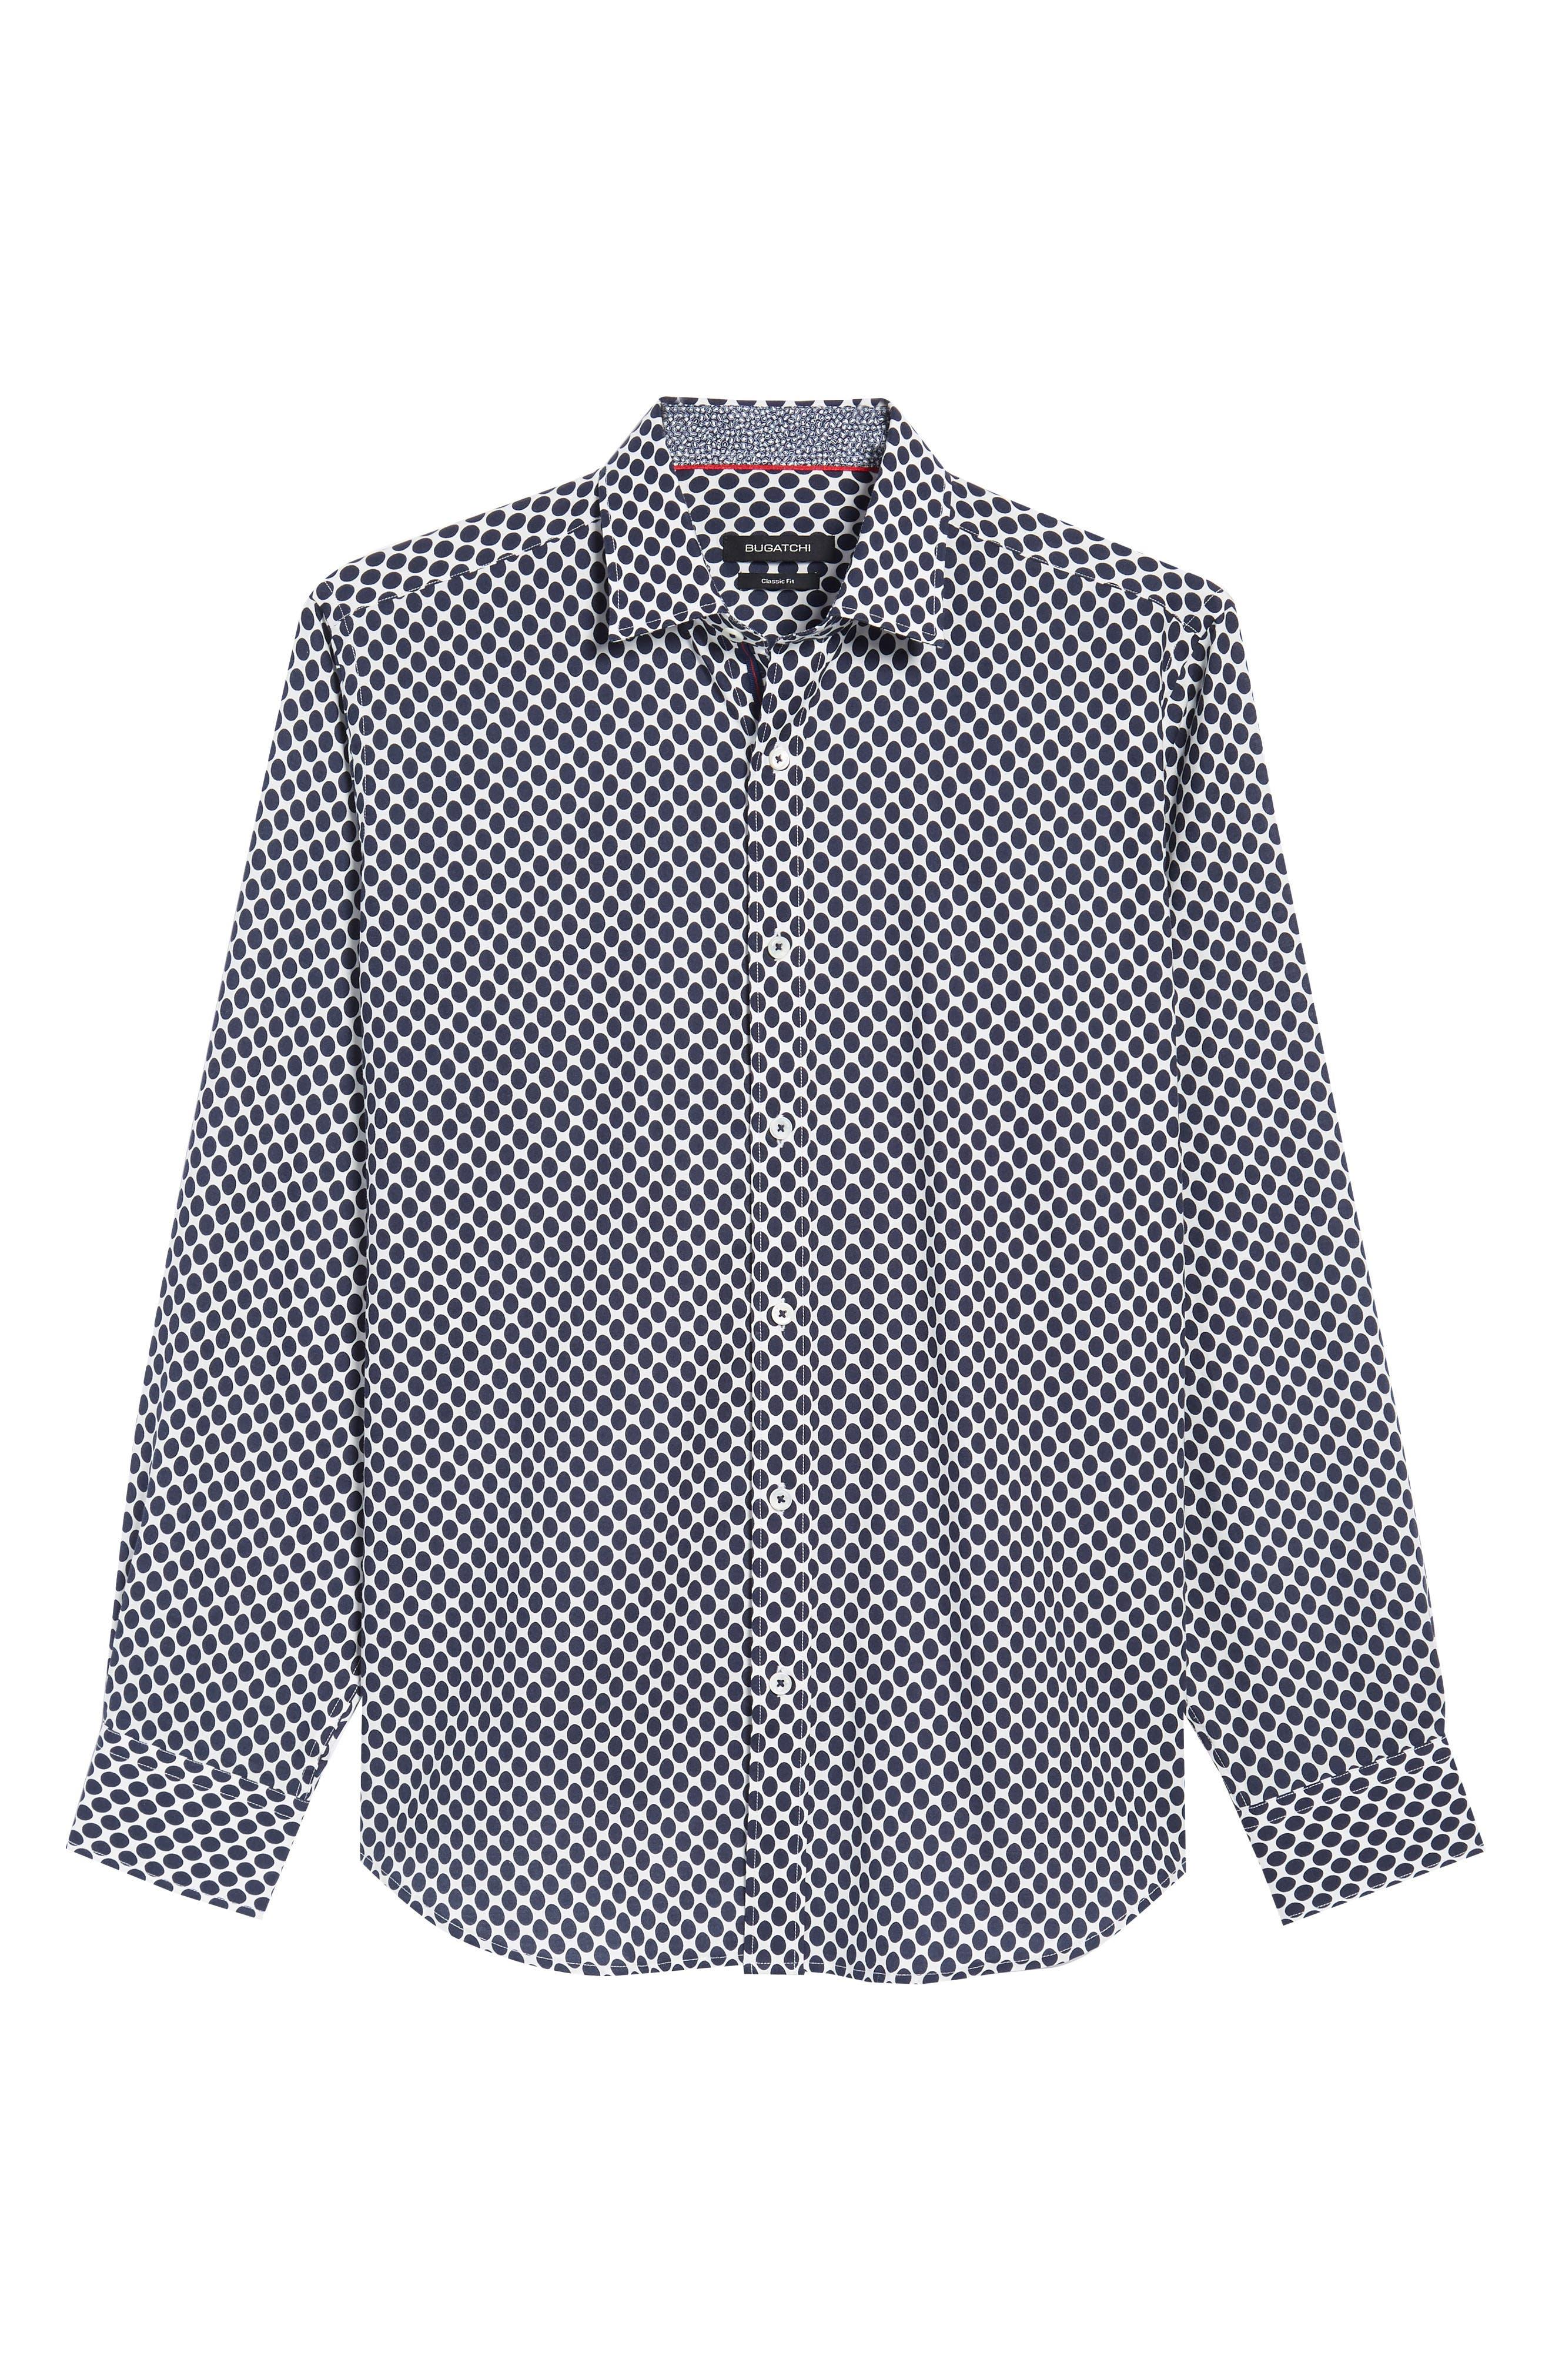 Classic Fit Woven Sport Shirt,                             Alternate thumbnail 6, color,                             NAVY